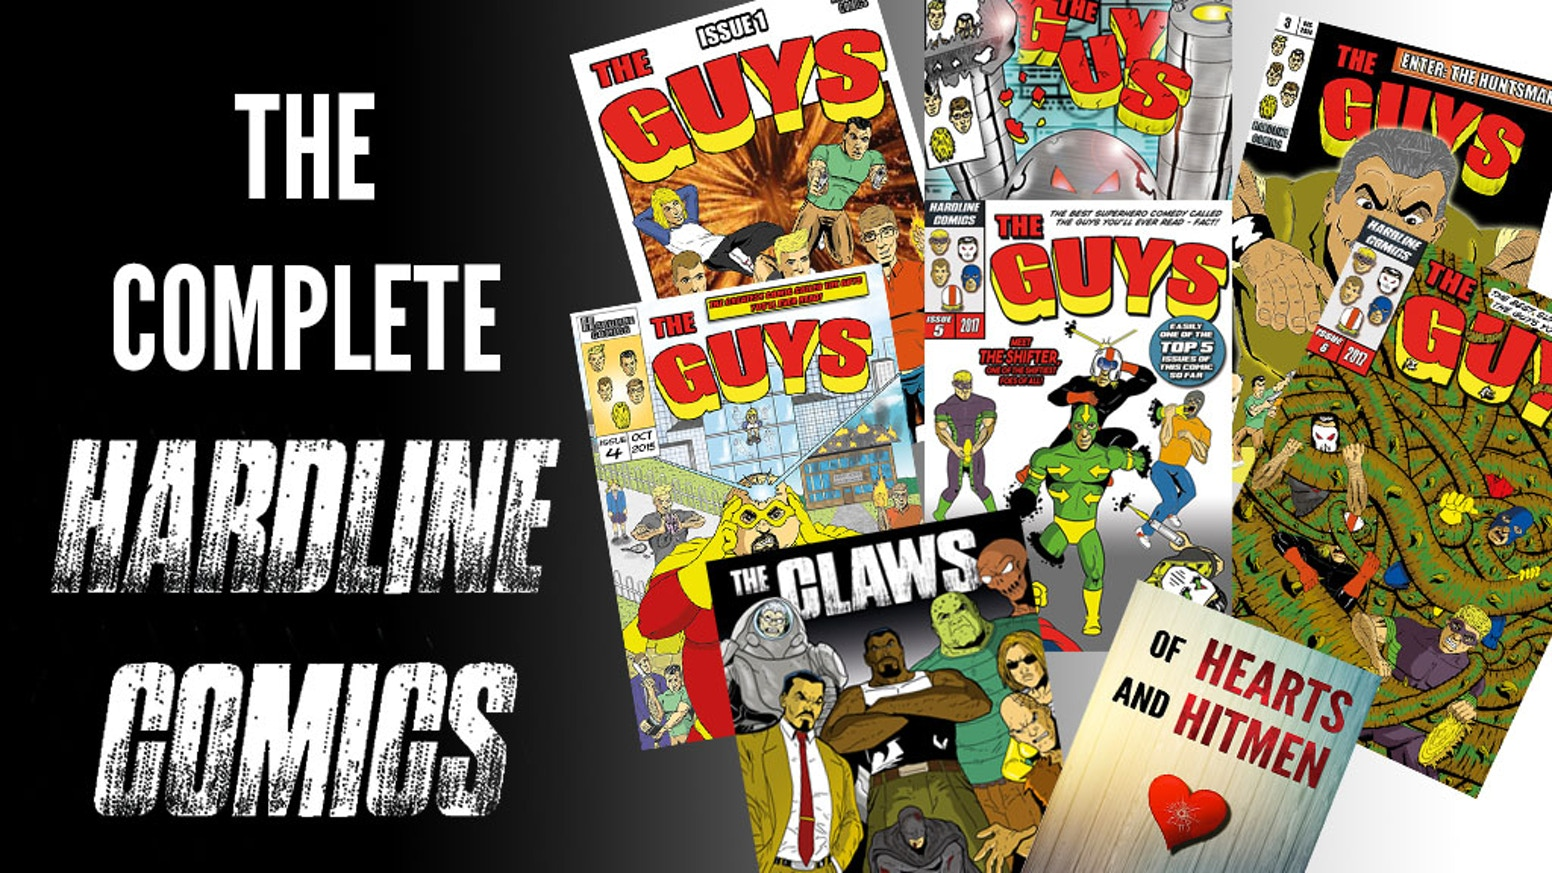 The Complete Hardline Comics